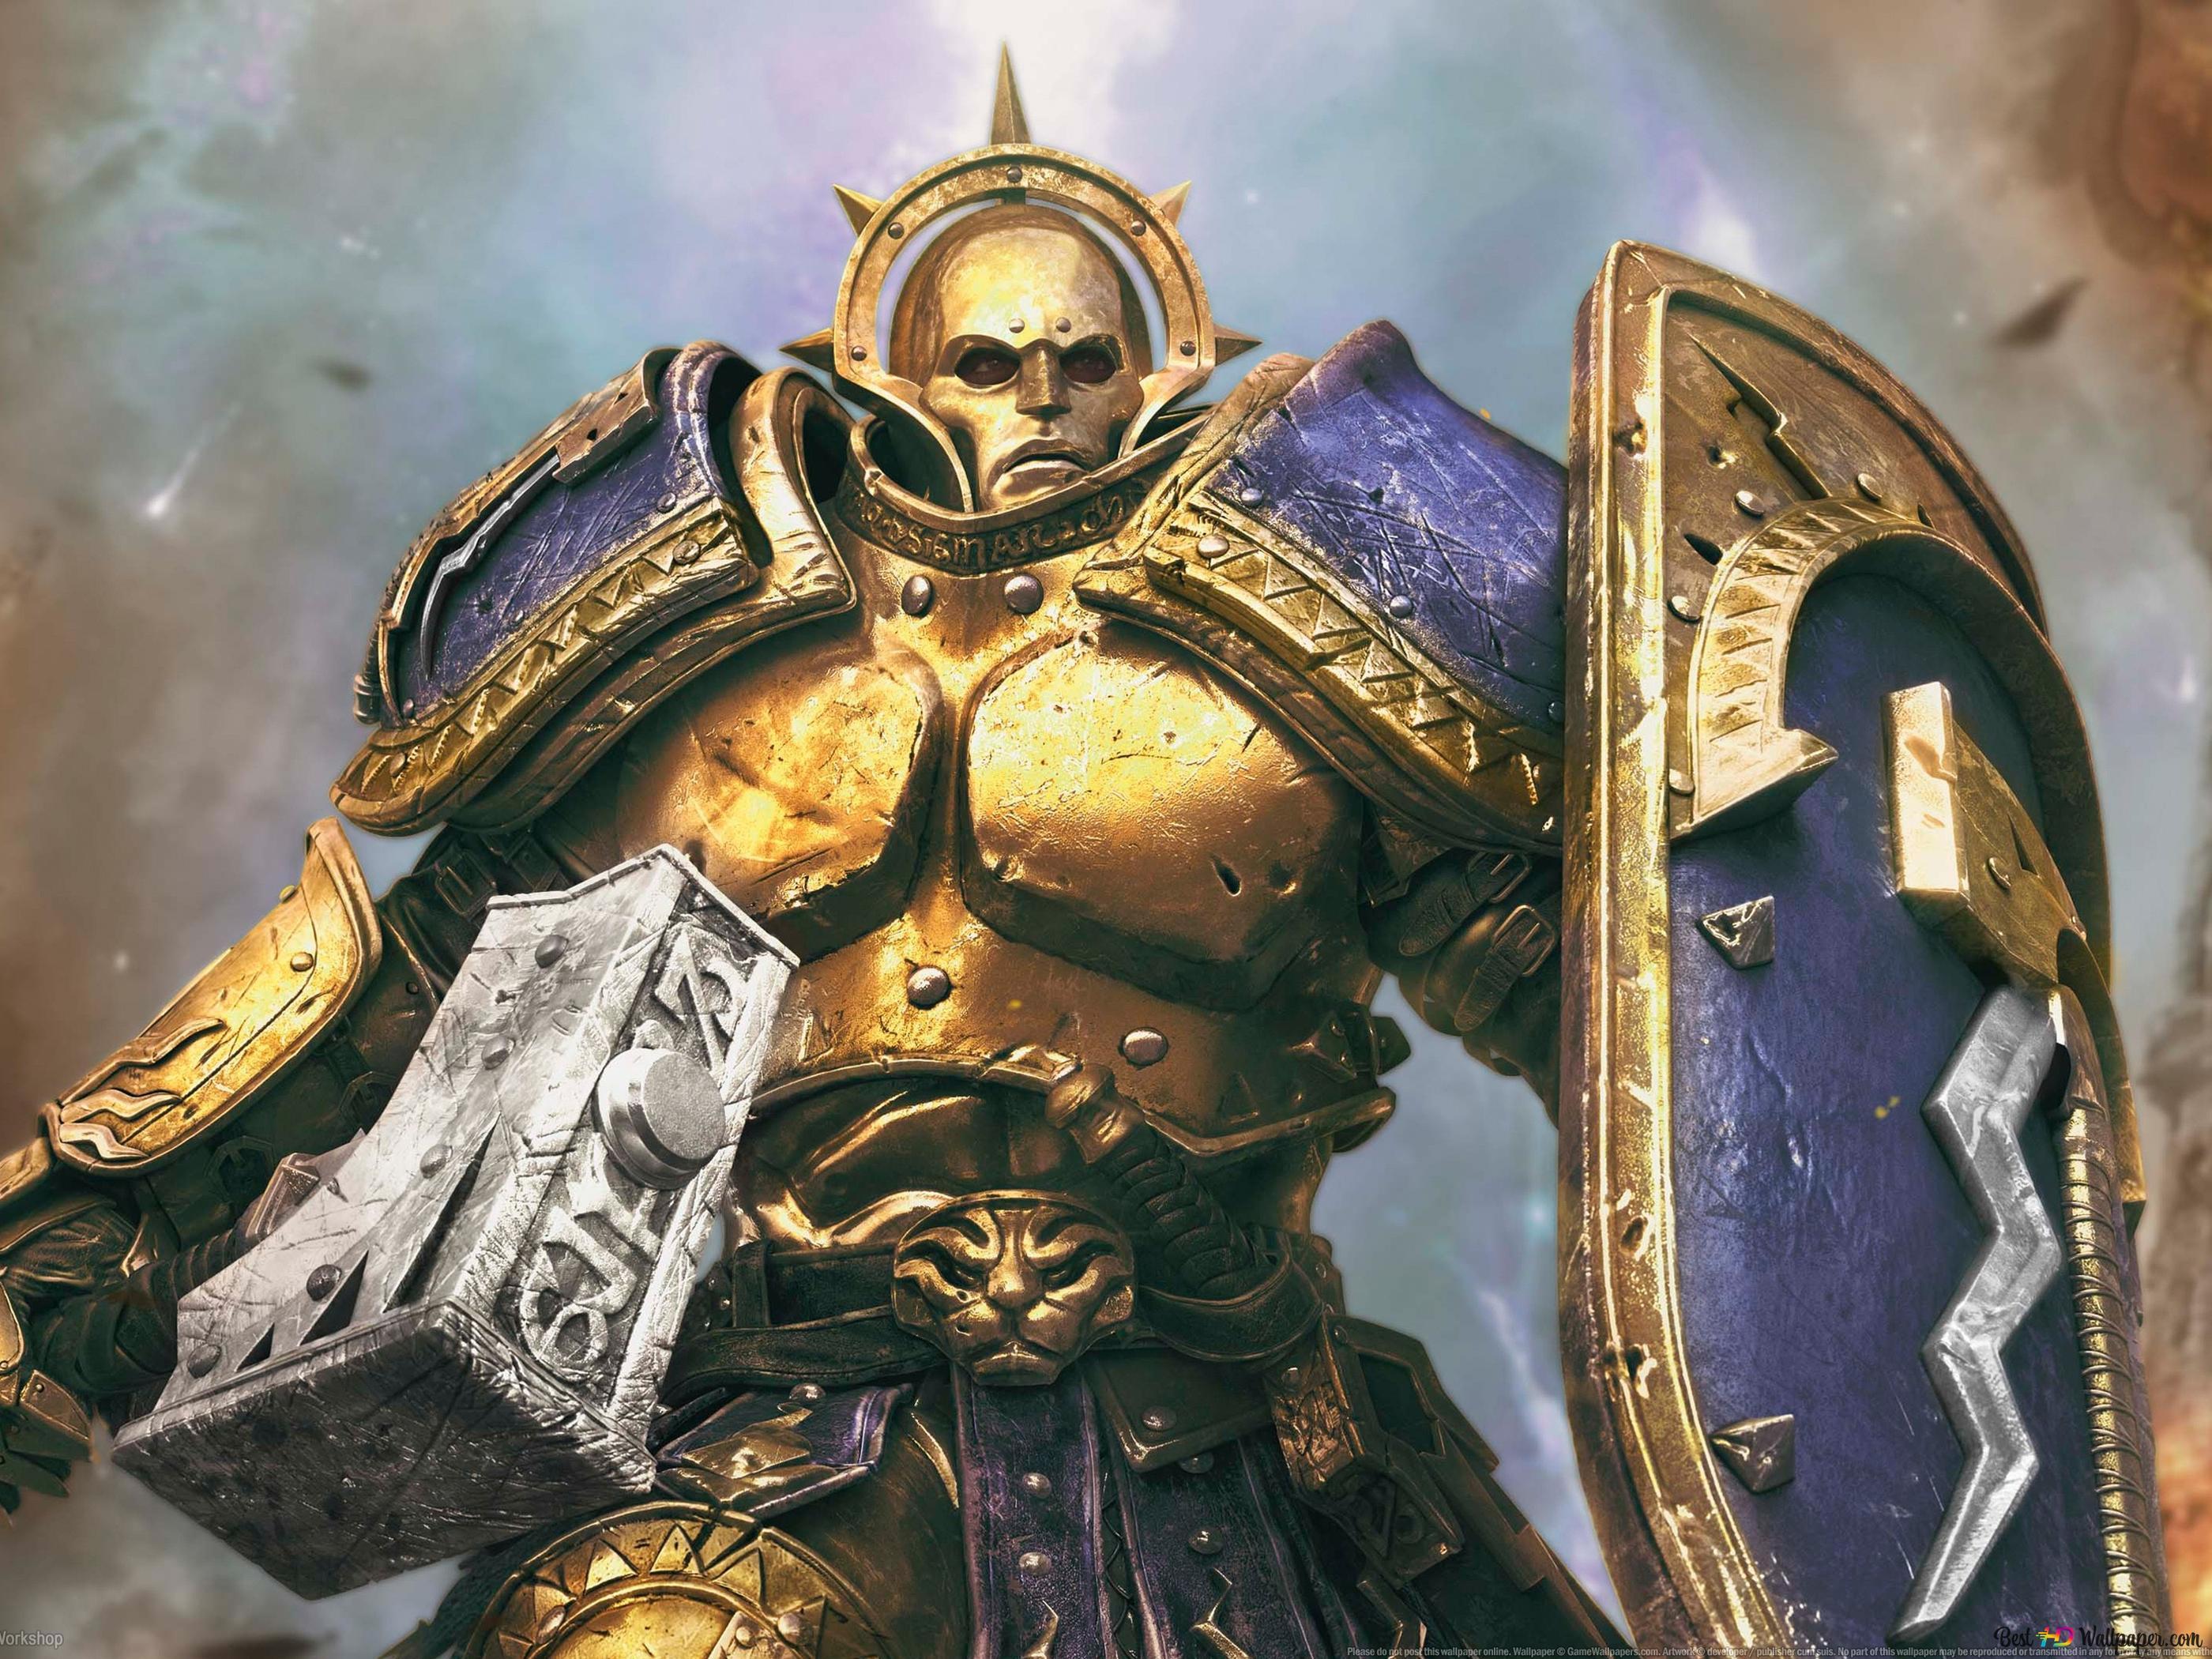 warhammer's battle hd wallpaper download